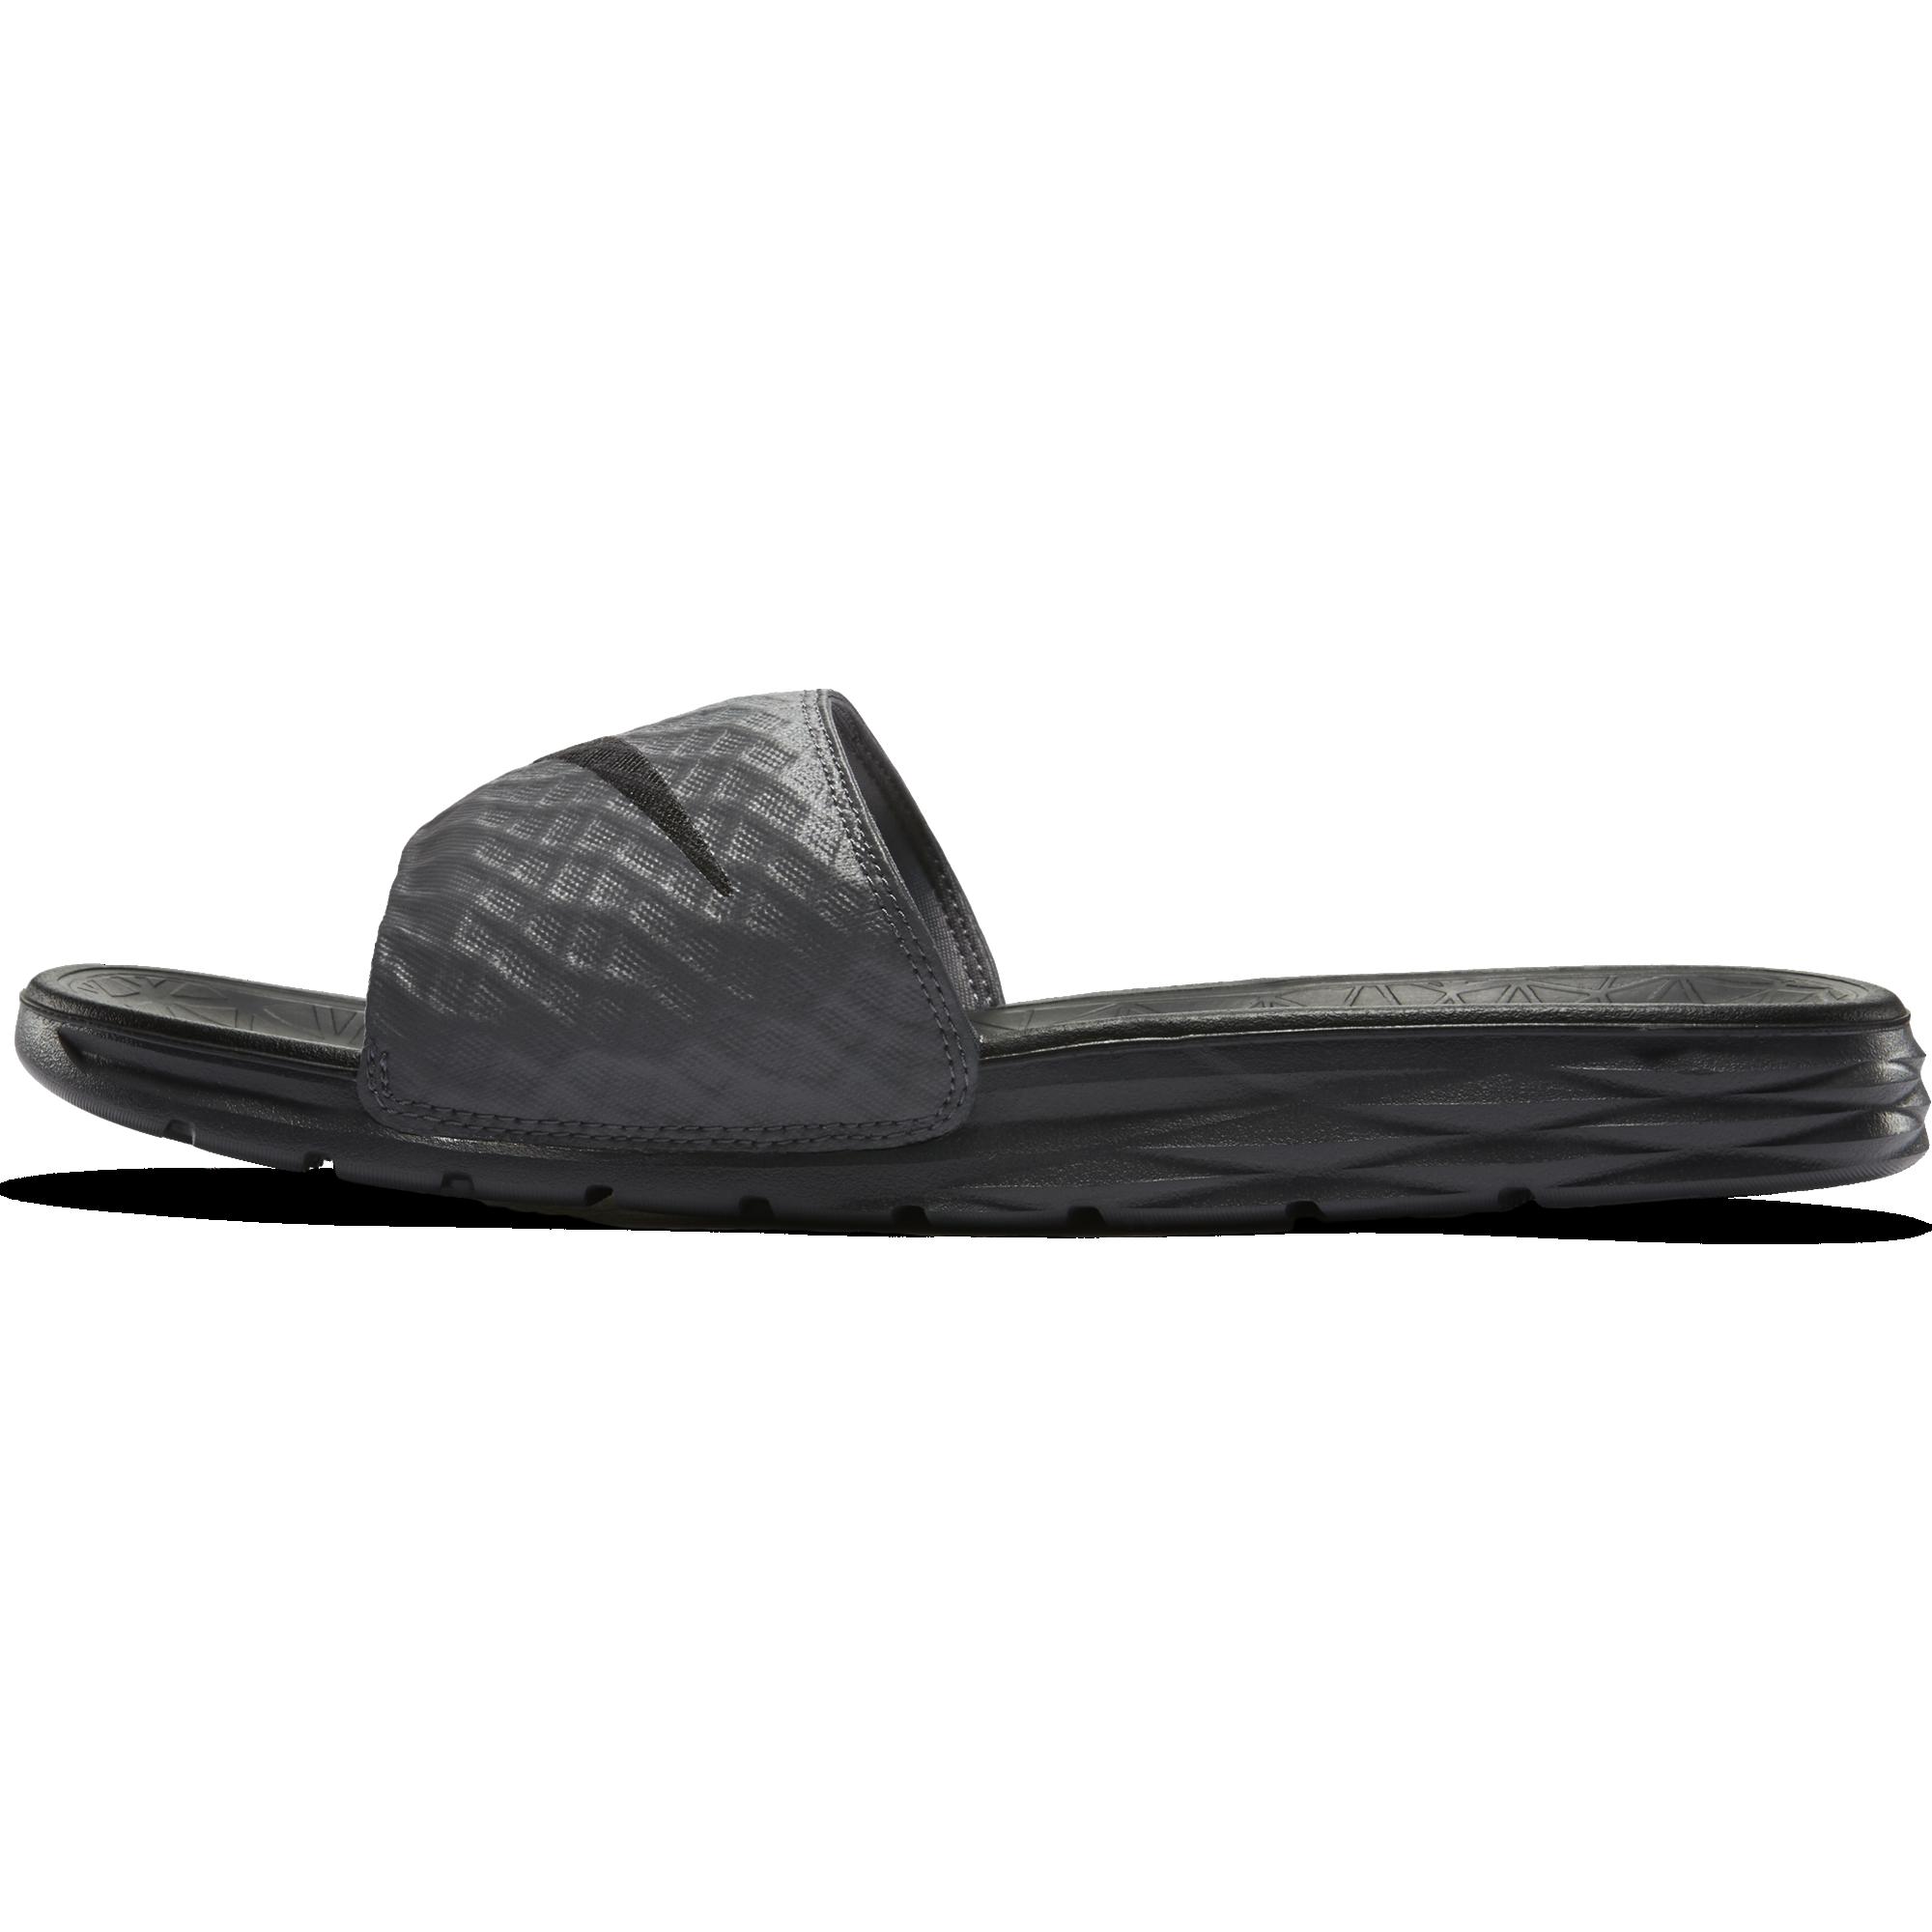 5c5ba98cf0ec Nike Benassi Solarsoft 2 Slide Sandal - Dark Grey Black